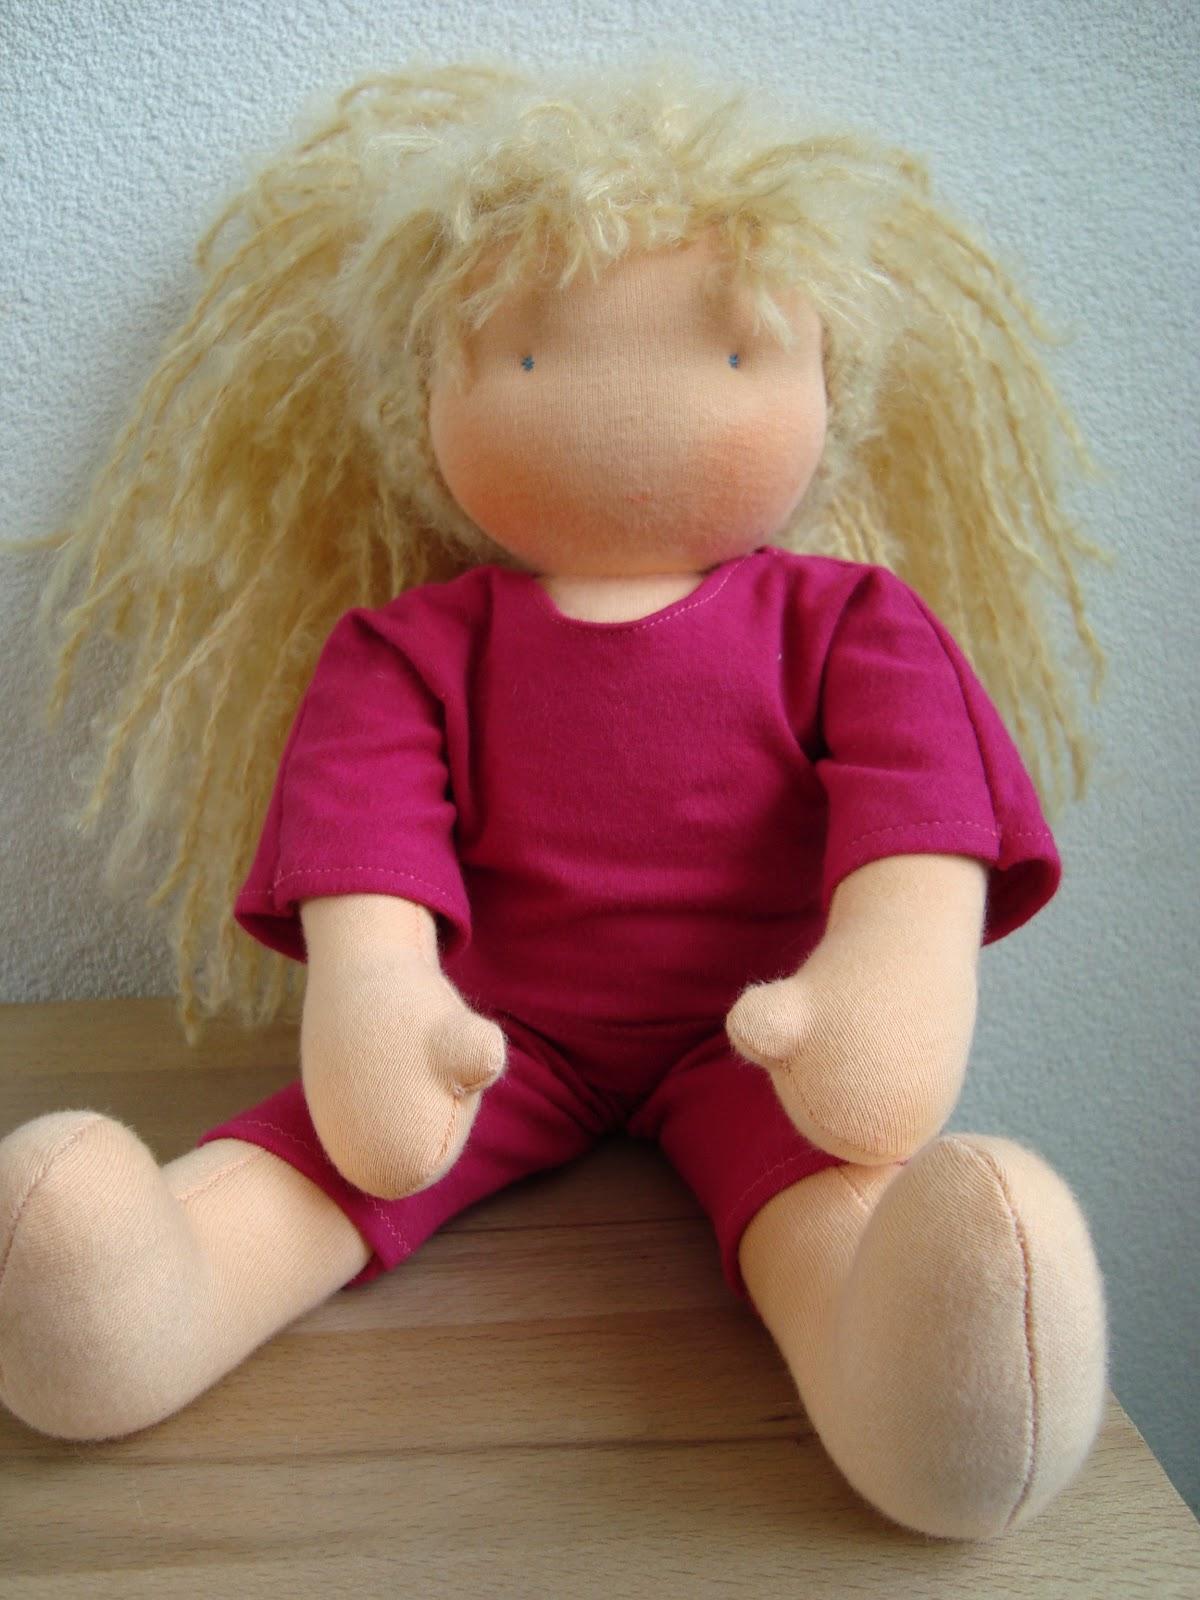 ineke grey dolls